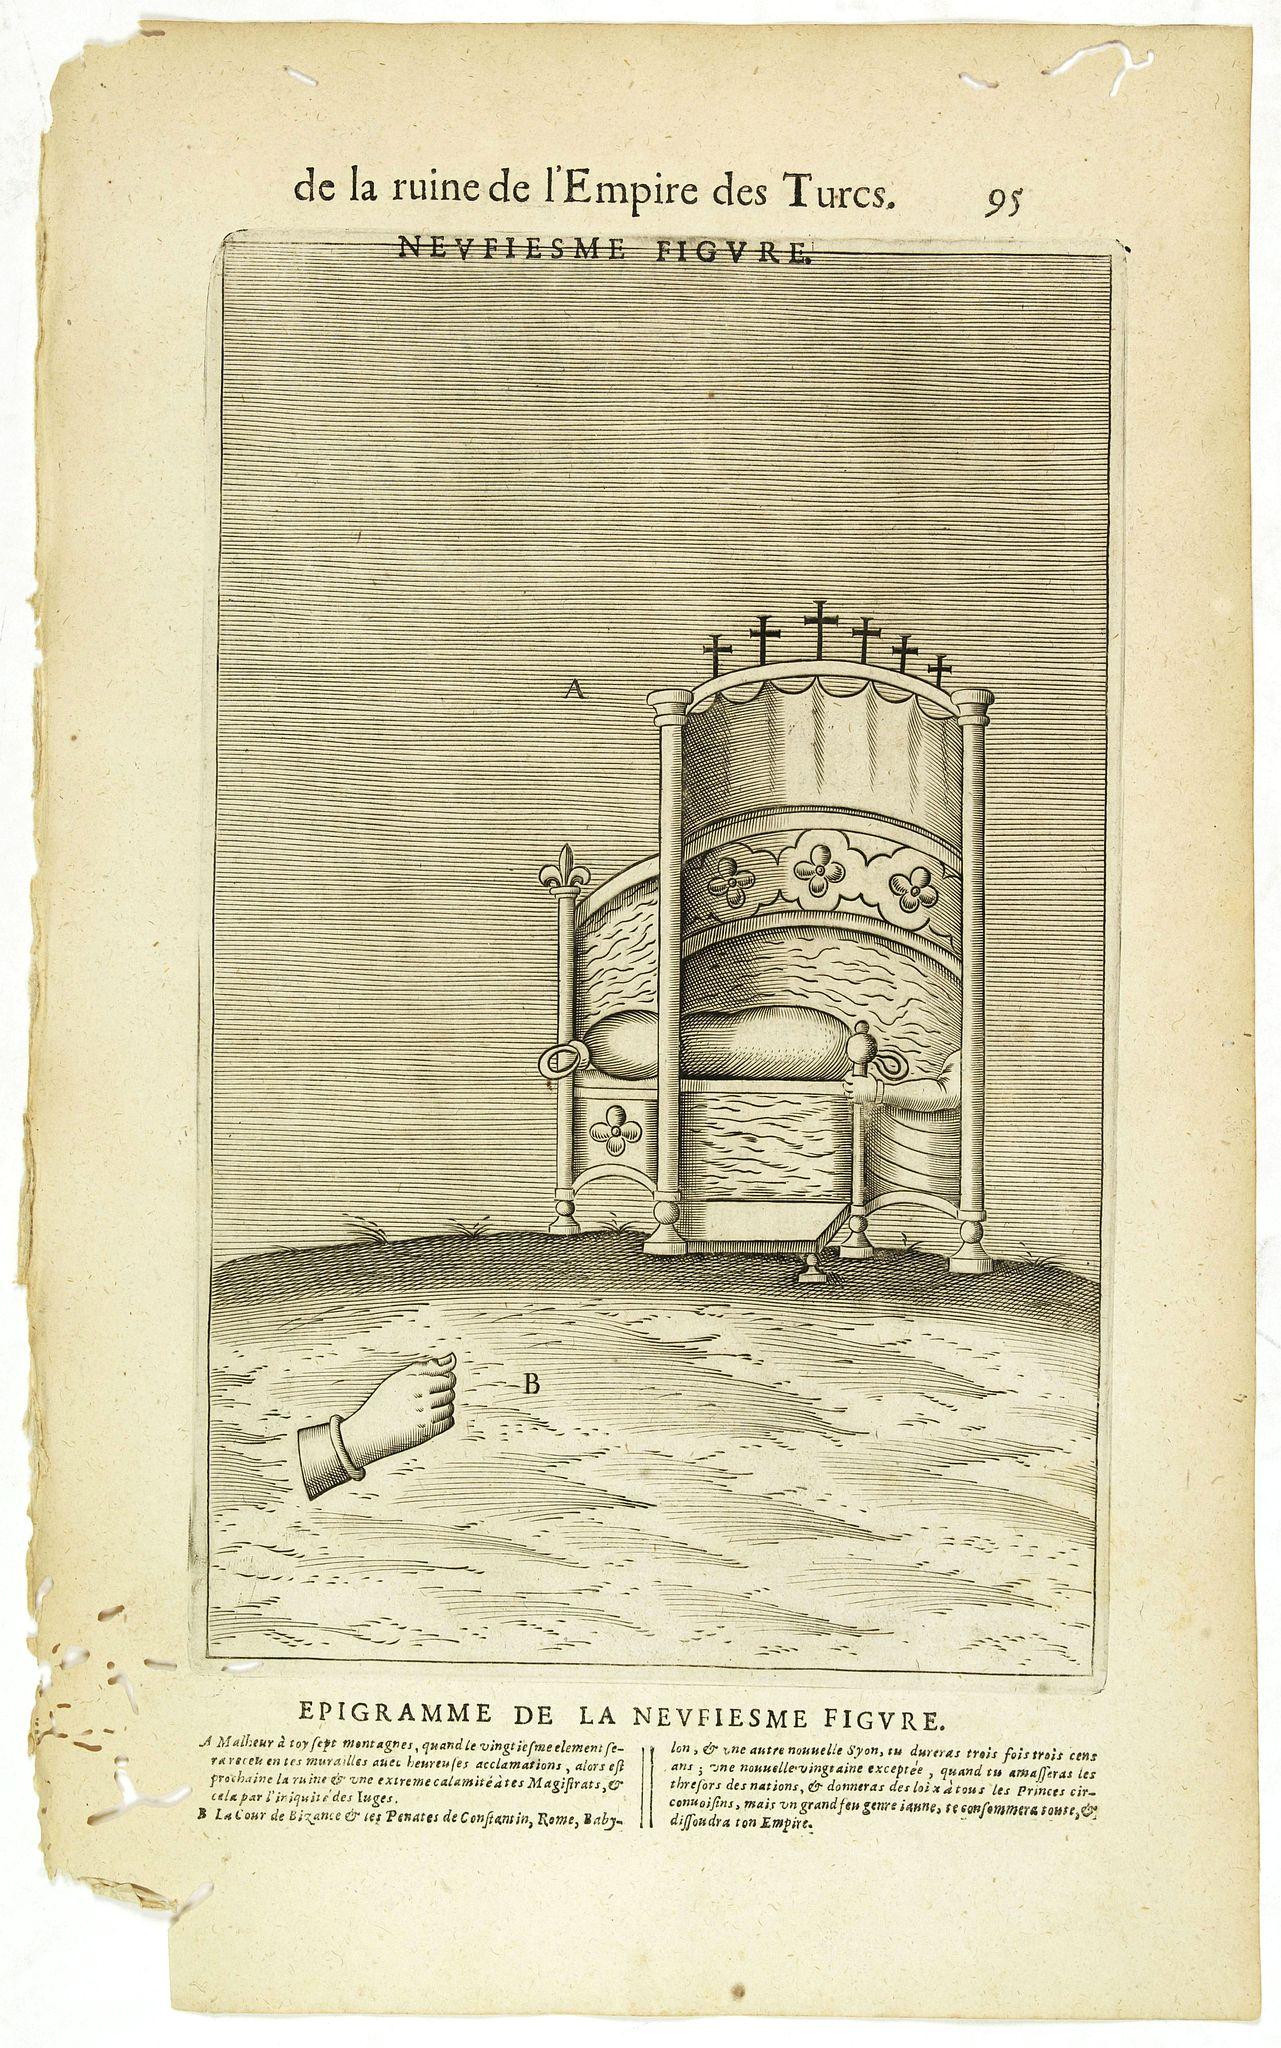 NICOLAS DE NICOLAY, Thomas Artus (sieur d'Embry). -  De la Ruine de l'Empire des Turcs Neufiesme figure / Epigramme de la Neufiesmie figure. (95)